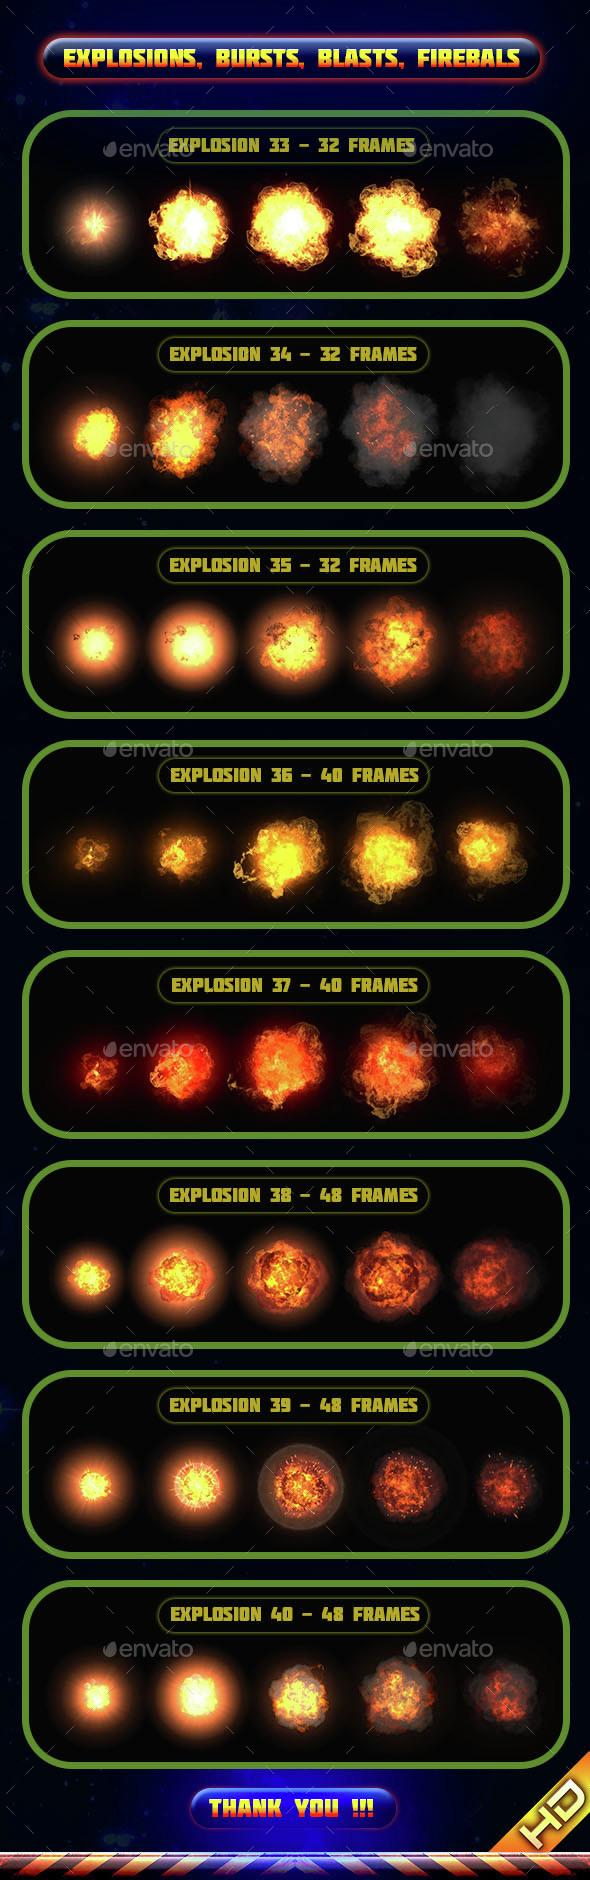 Explosions Blasts Bursts Detonations Fireballs 05 - Sprites Game Assets